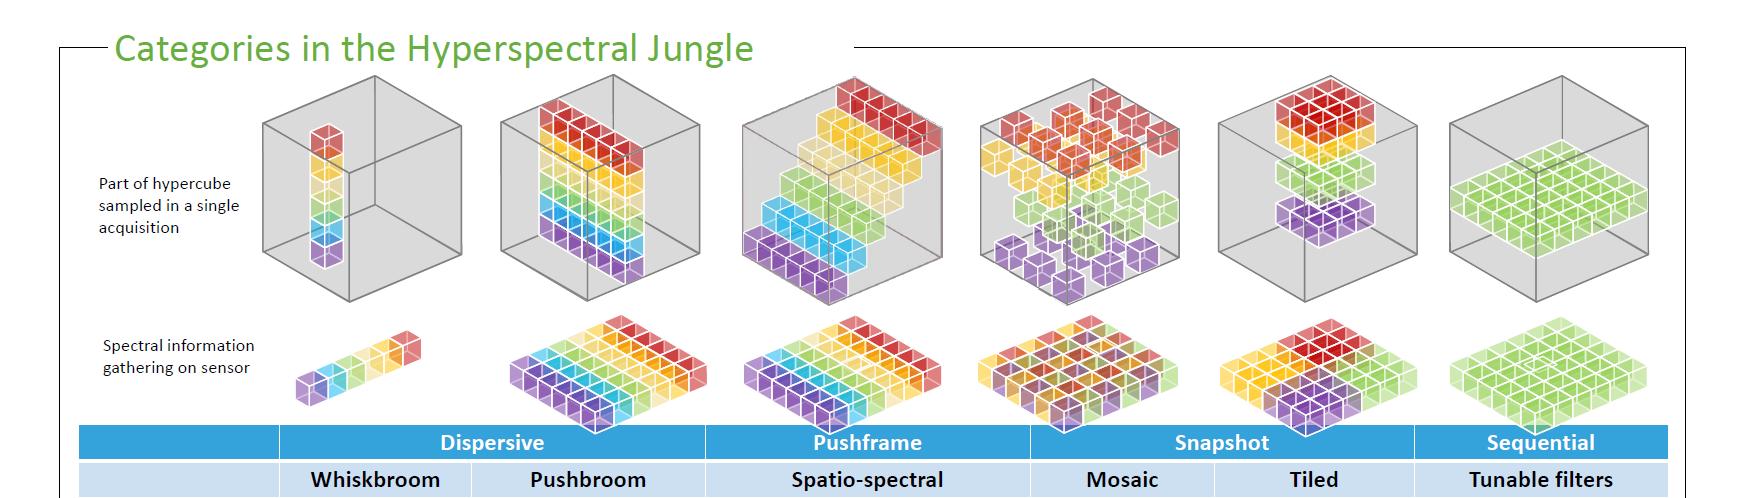 Categories hyperspectral jungle